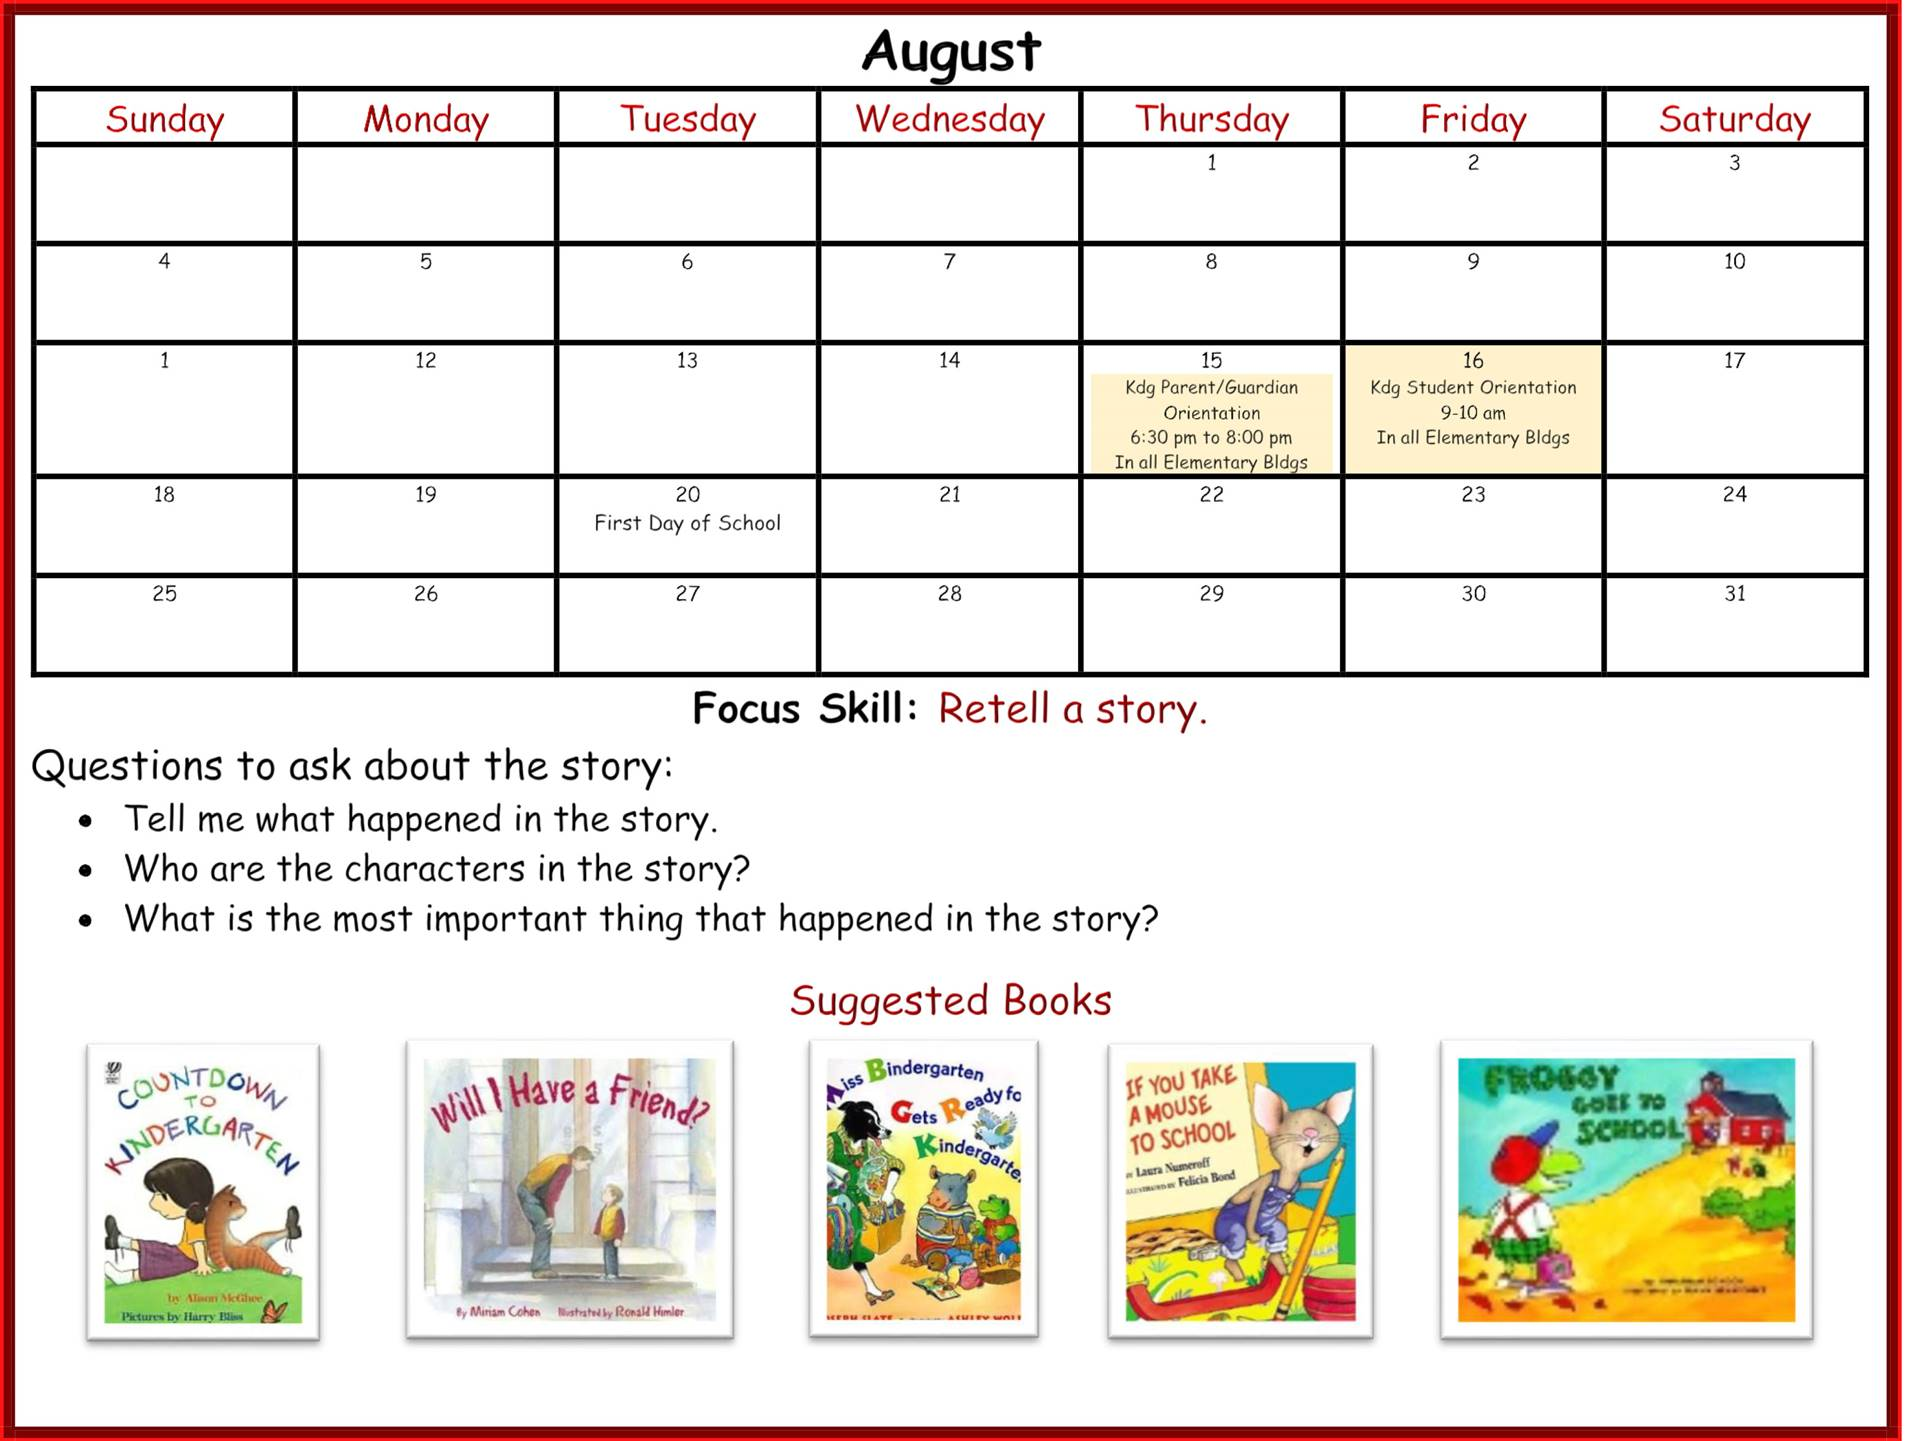 Kindergarten Readiness Calendar - August page 1